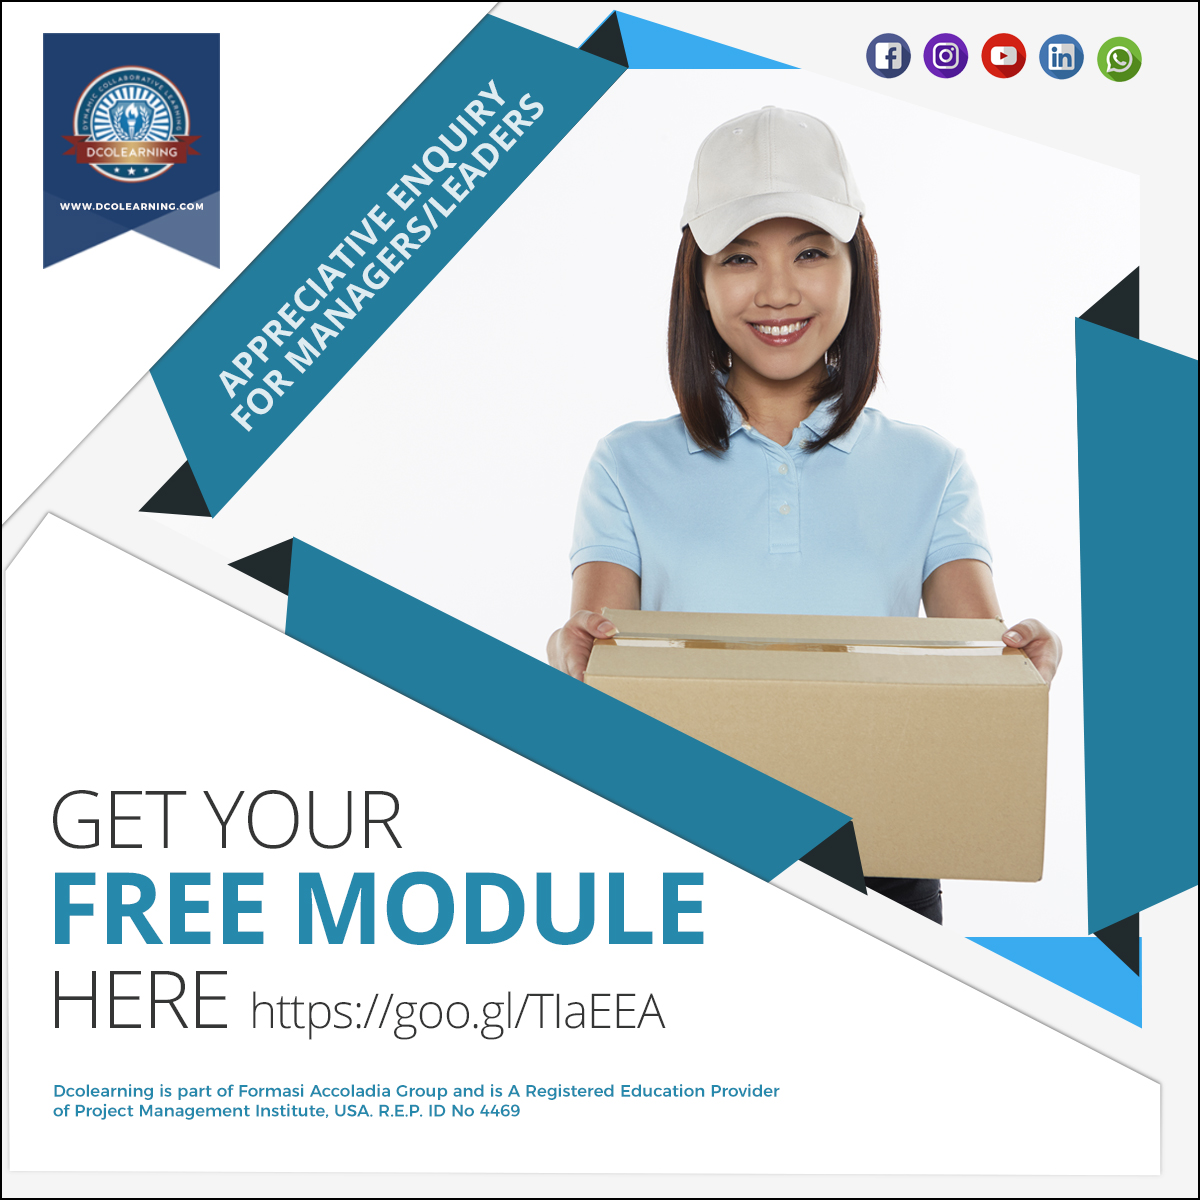 Dcolearning - Free Module